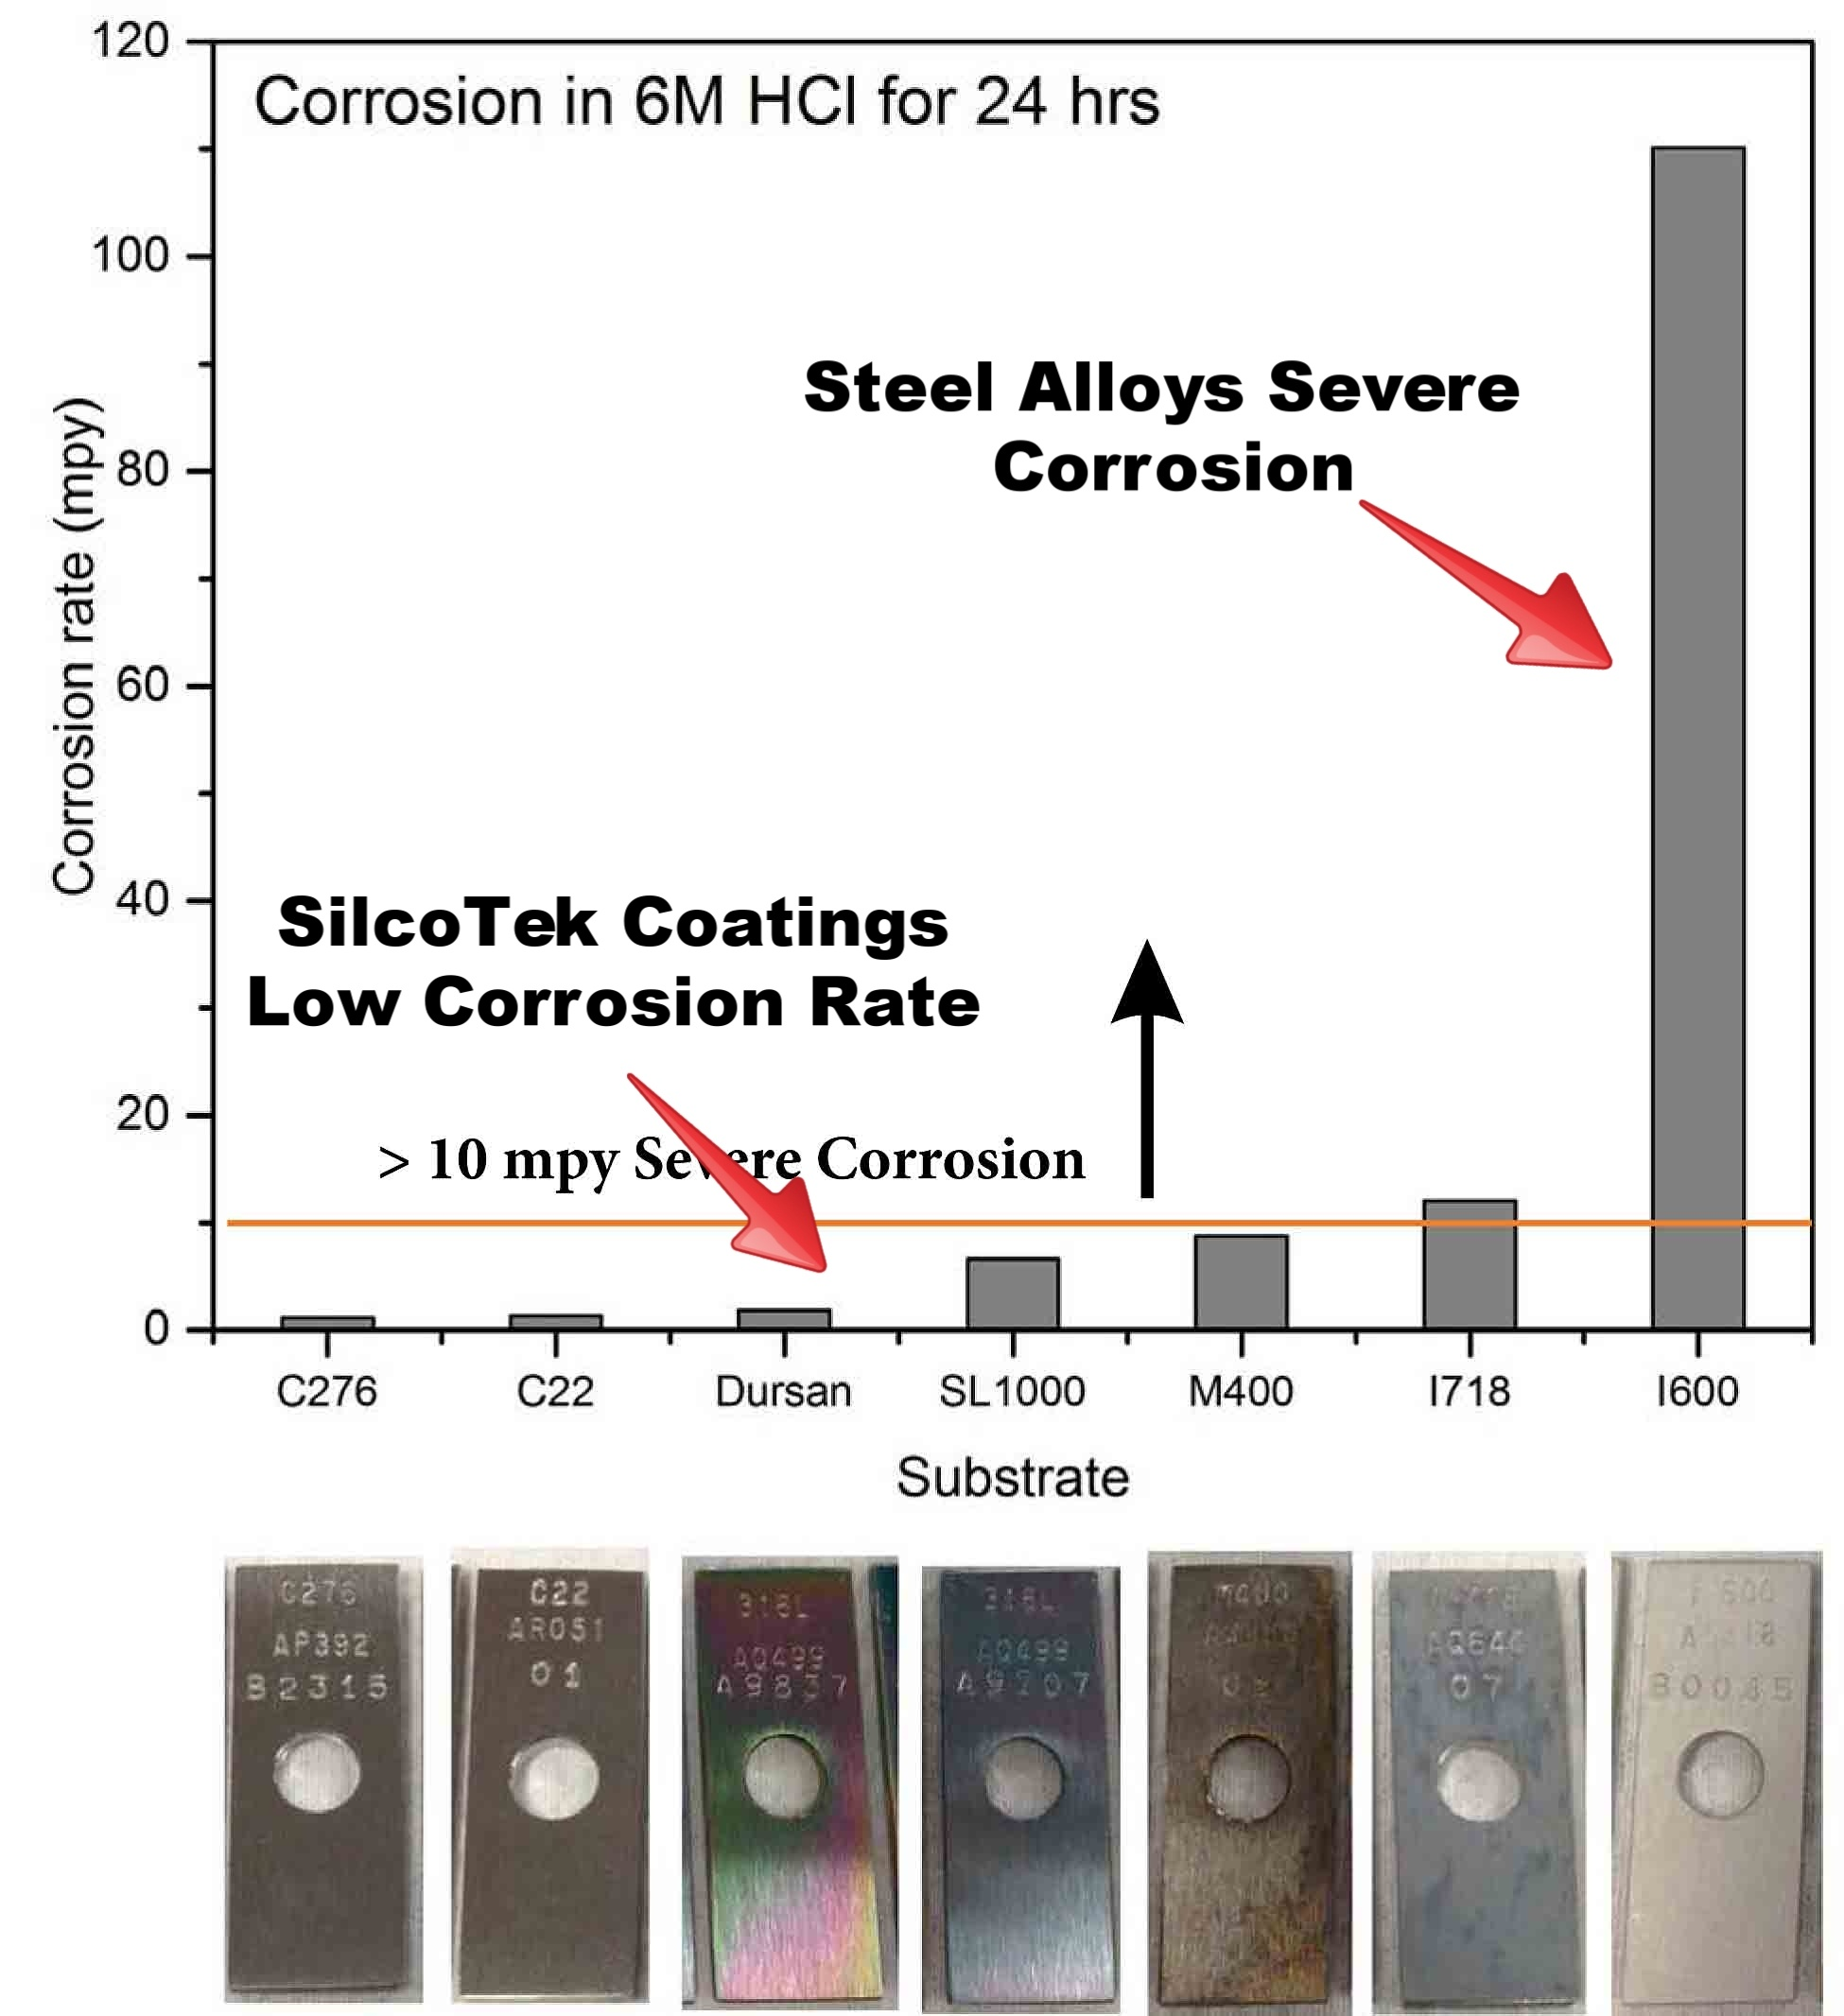 Alloy_HCL_Corrosion_Comparison_2_10_26_15-158824-edited.jpg